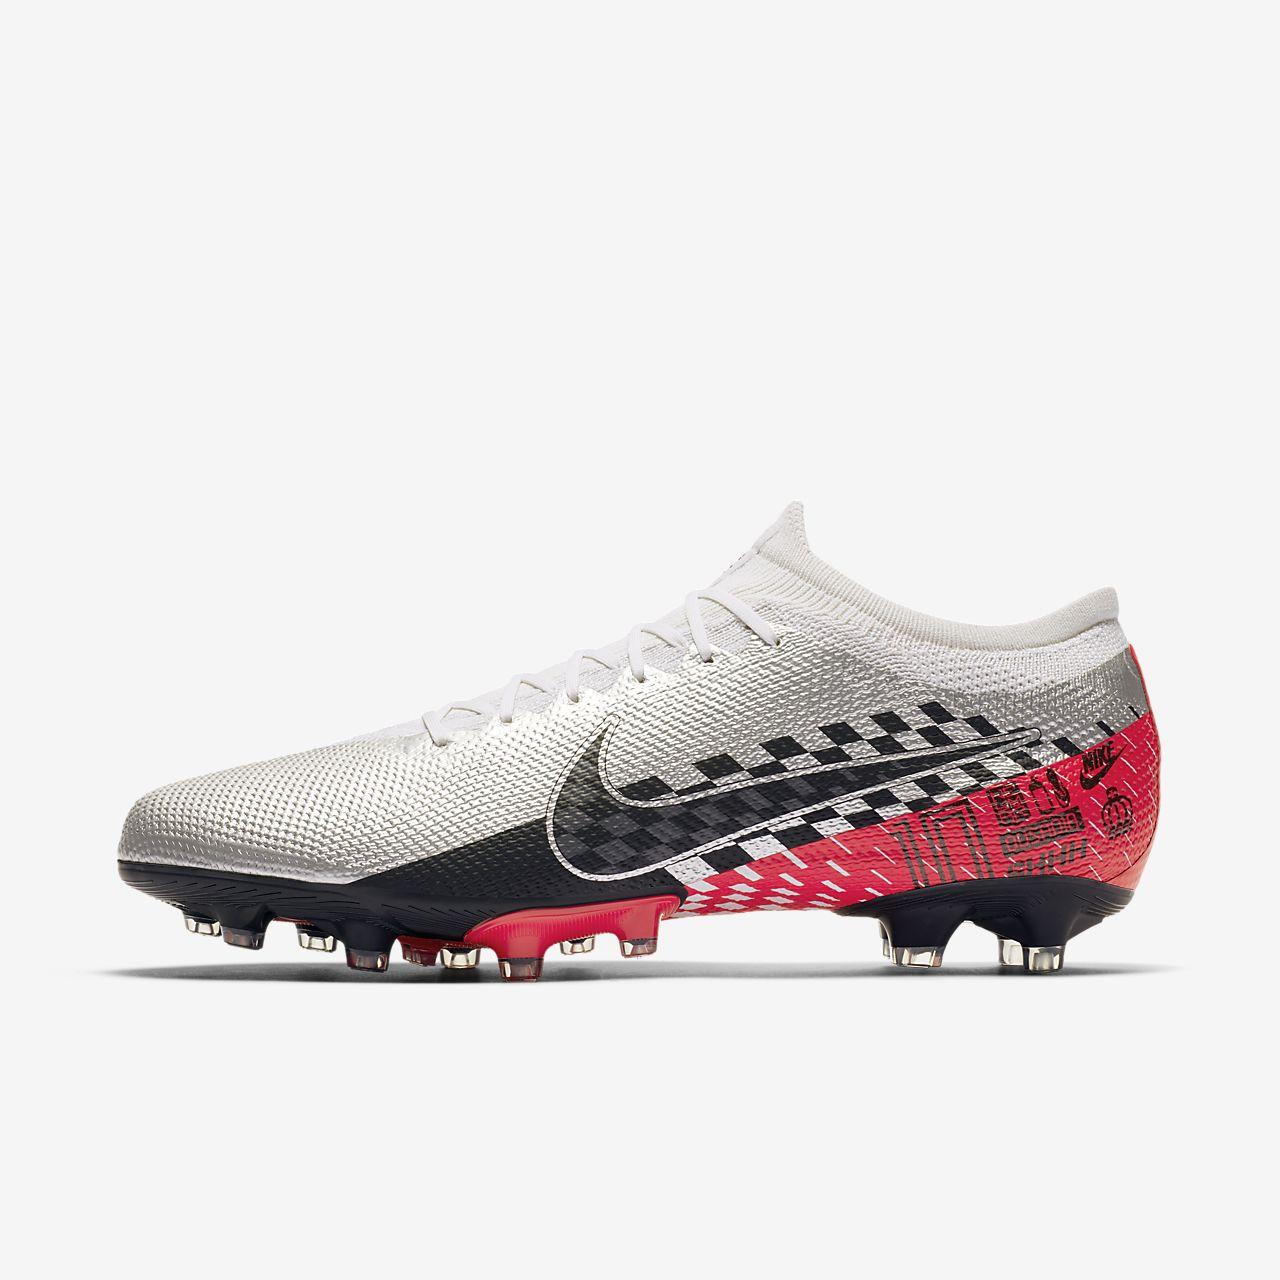 Fútbol Azul Nike Zapatillas de fútbol sala de Neymar Jr. MercurialX Vortex III (IC) Nike Hombre AzulPlata > Ceip Joseplata